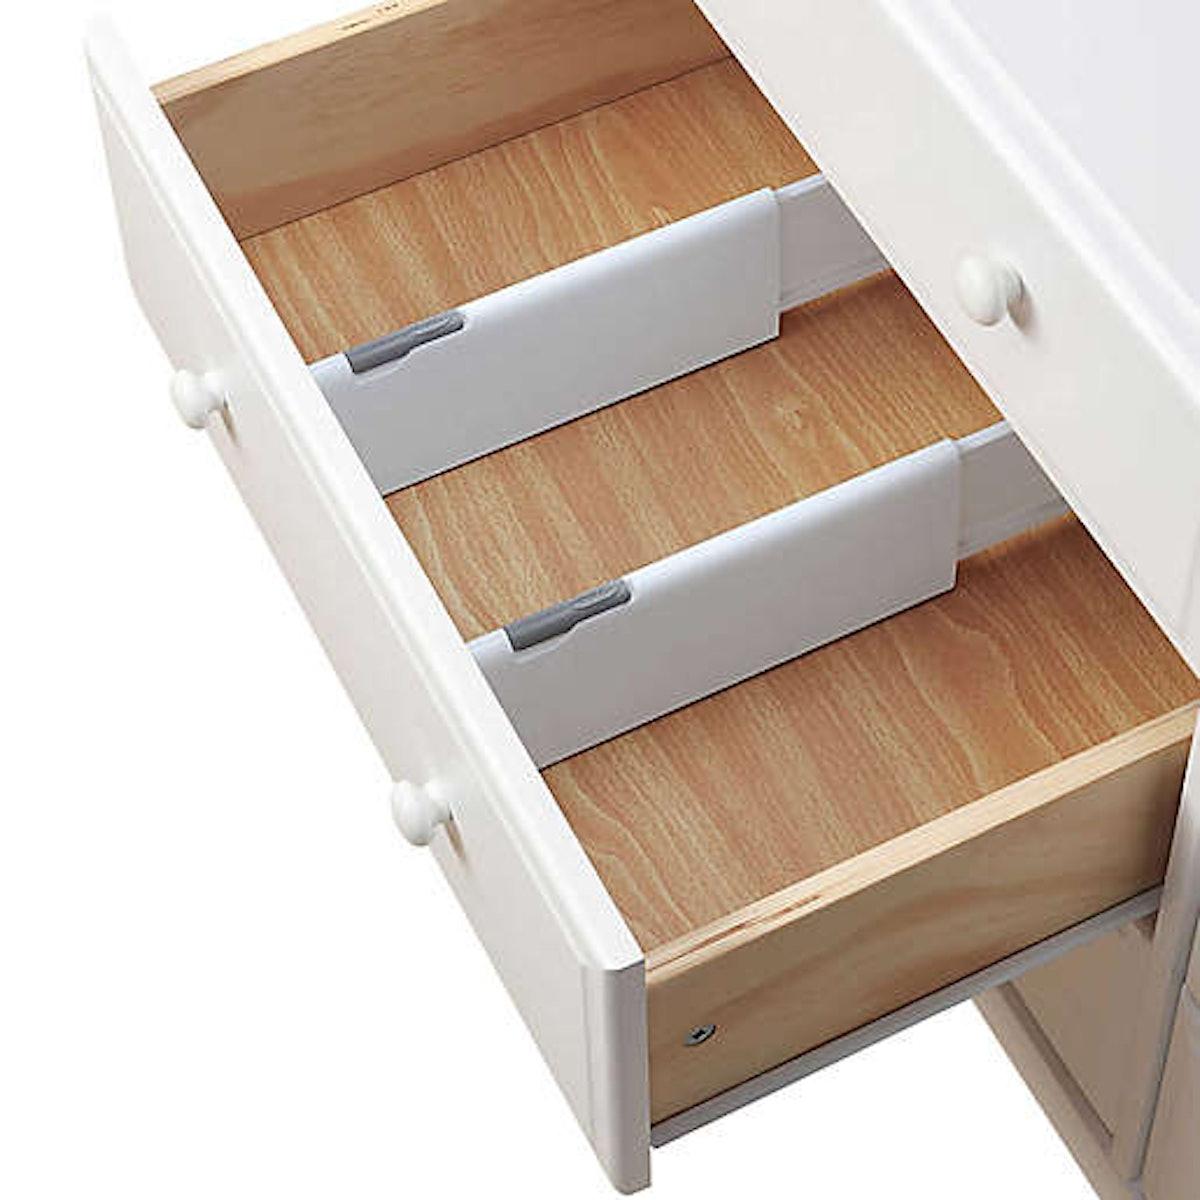 OXO Good Grips Expandable Dresser Drawer Divider (Set of 2)